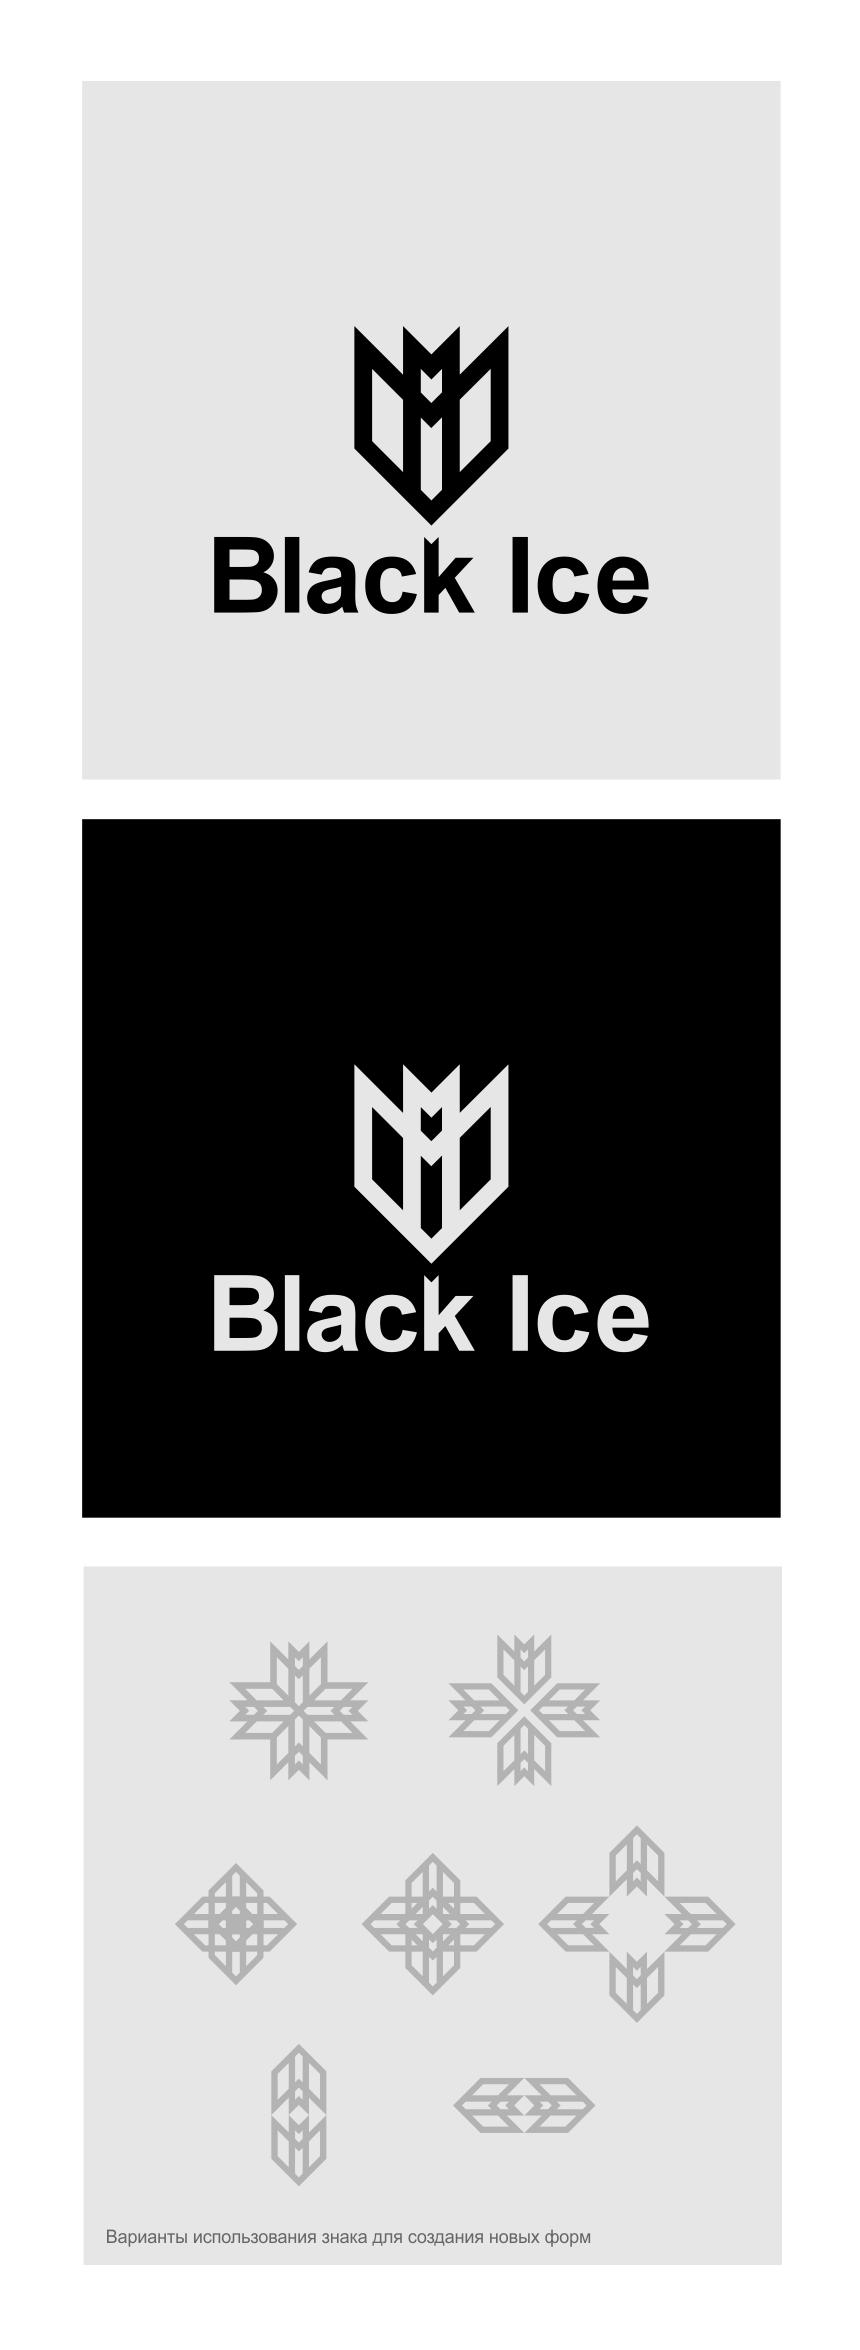 "Логотип + Фирменный стиль для компании ""BLACK ICE"" фото f_04856ded7f9a561e.jpg"